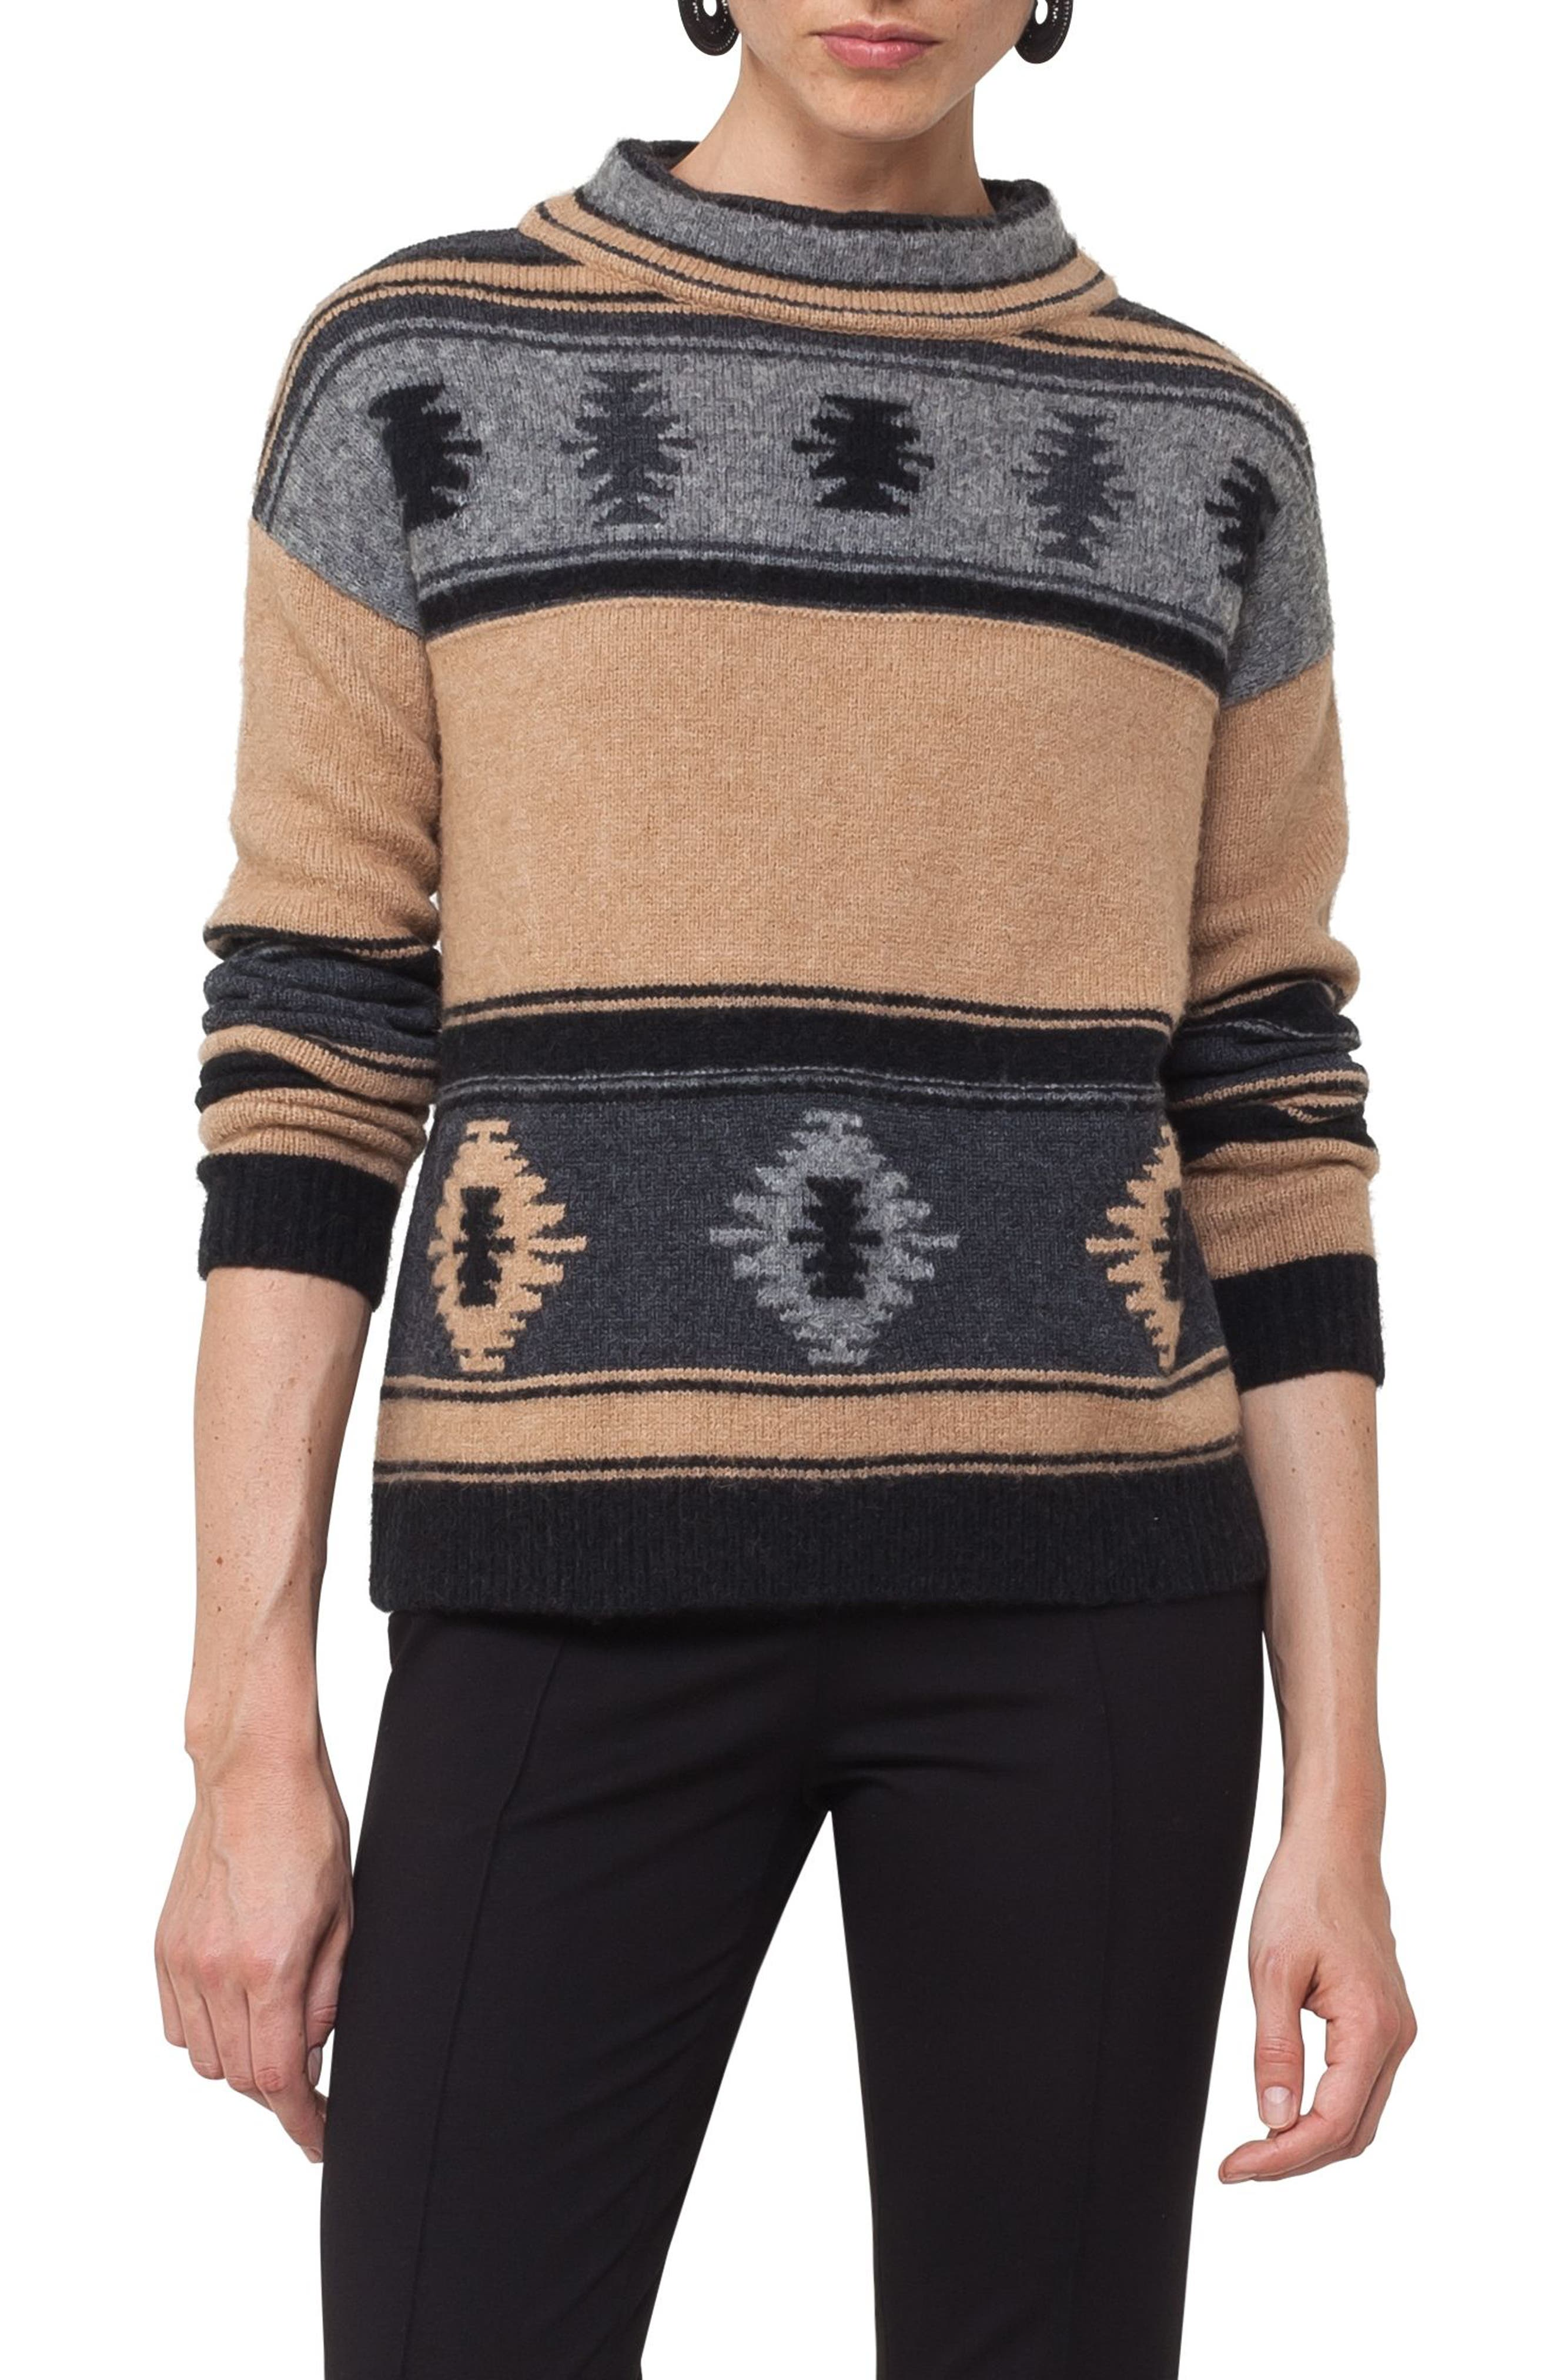 Wool Blend Pullover,                             Main thumbnail 1, color,                             Vicunia/ Stone/ Black